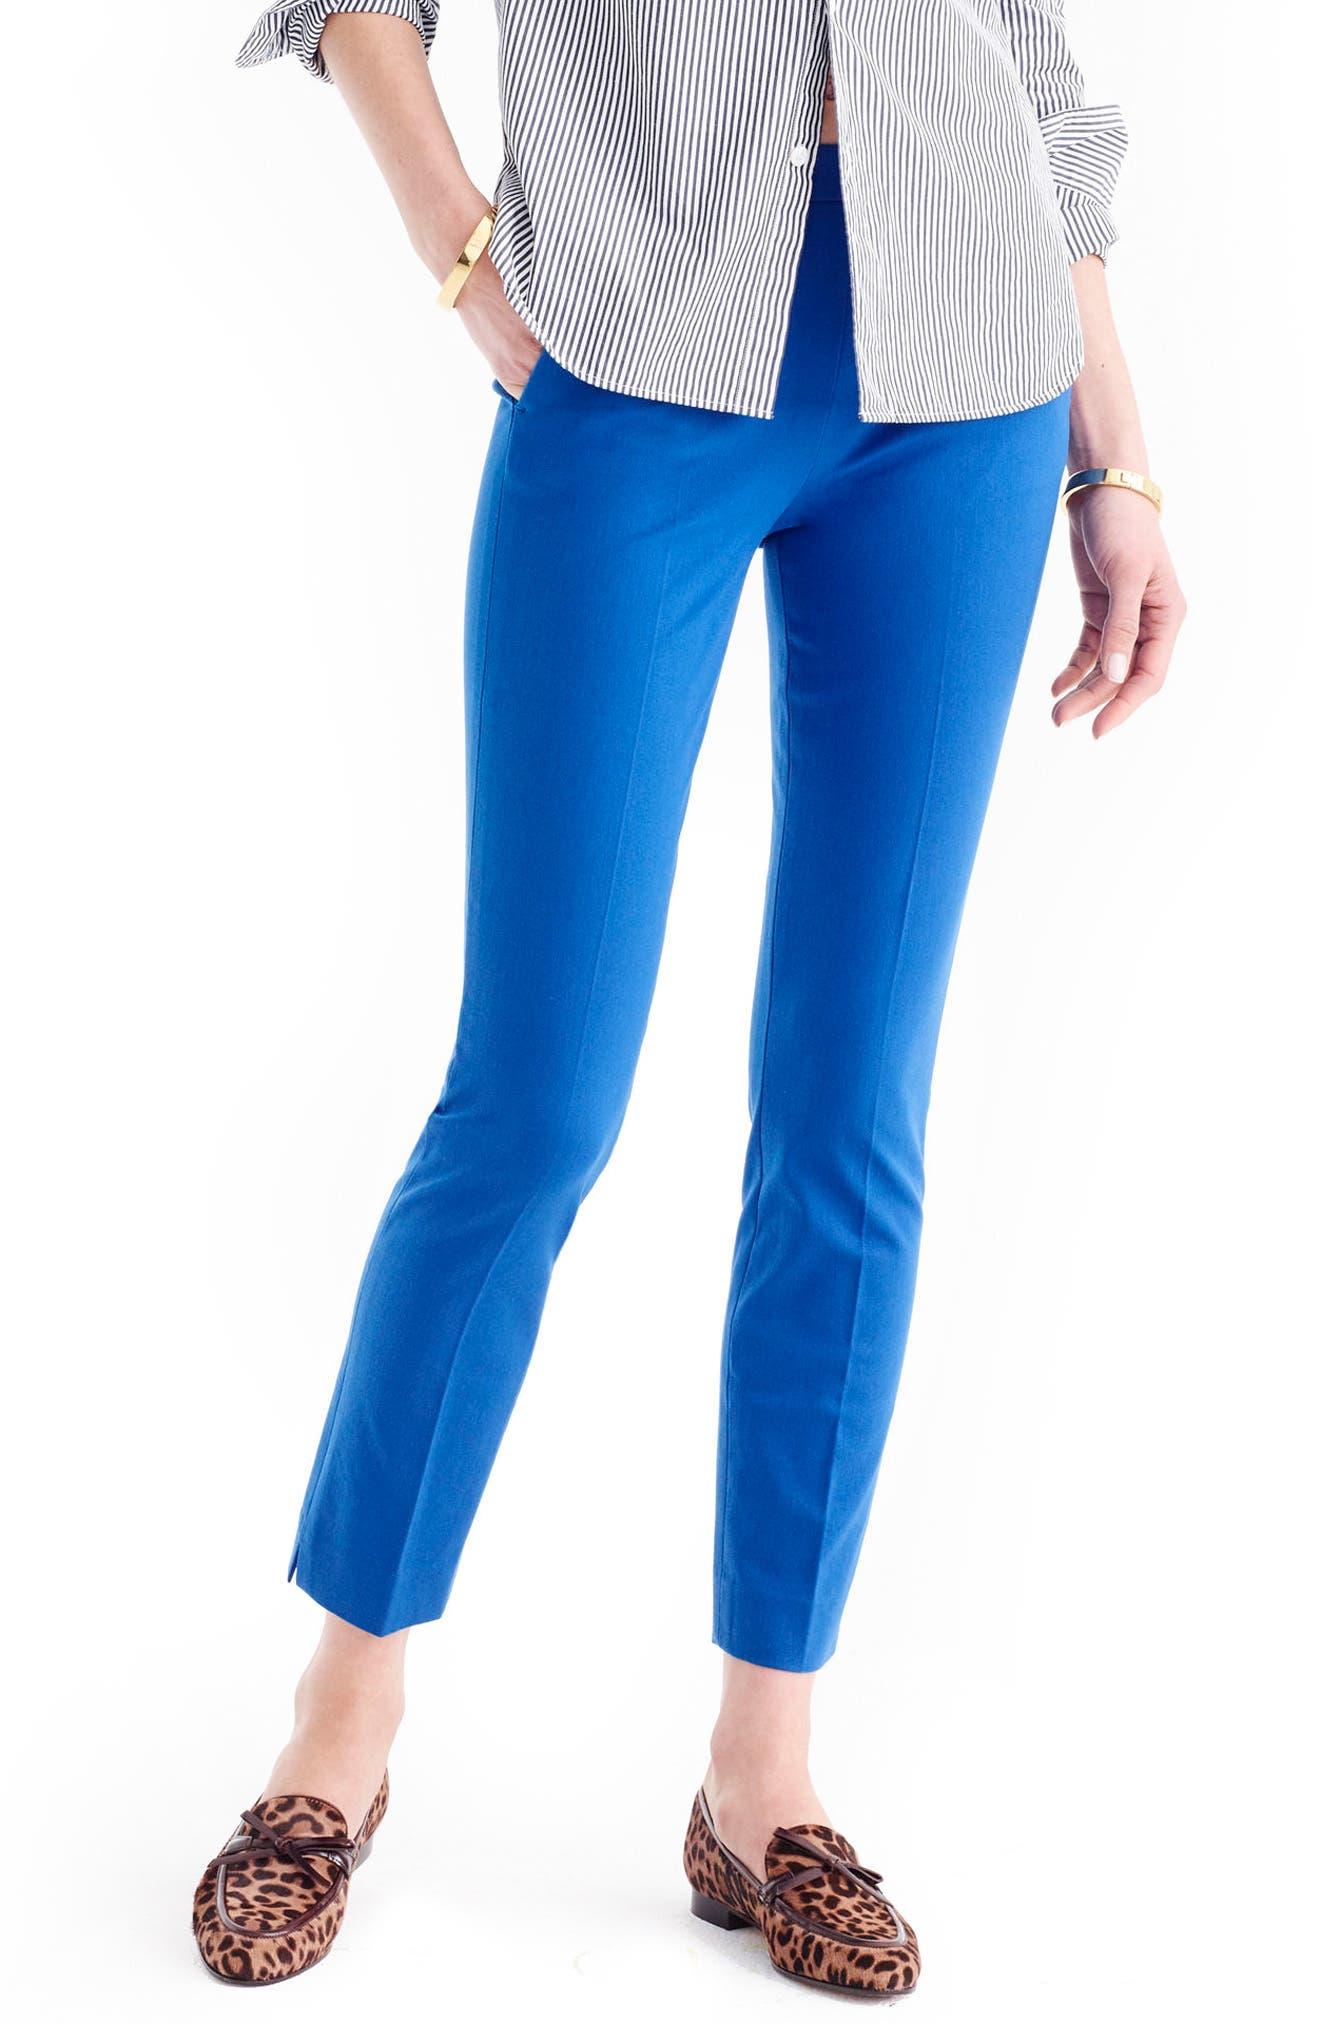 J.Crew 'Martie' Bi-Stretch Cotton Blend Pants (Regular & Petite)